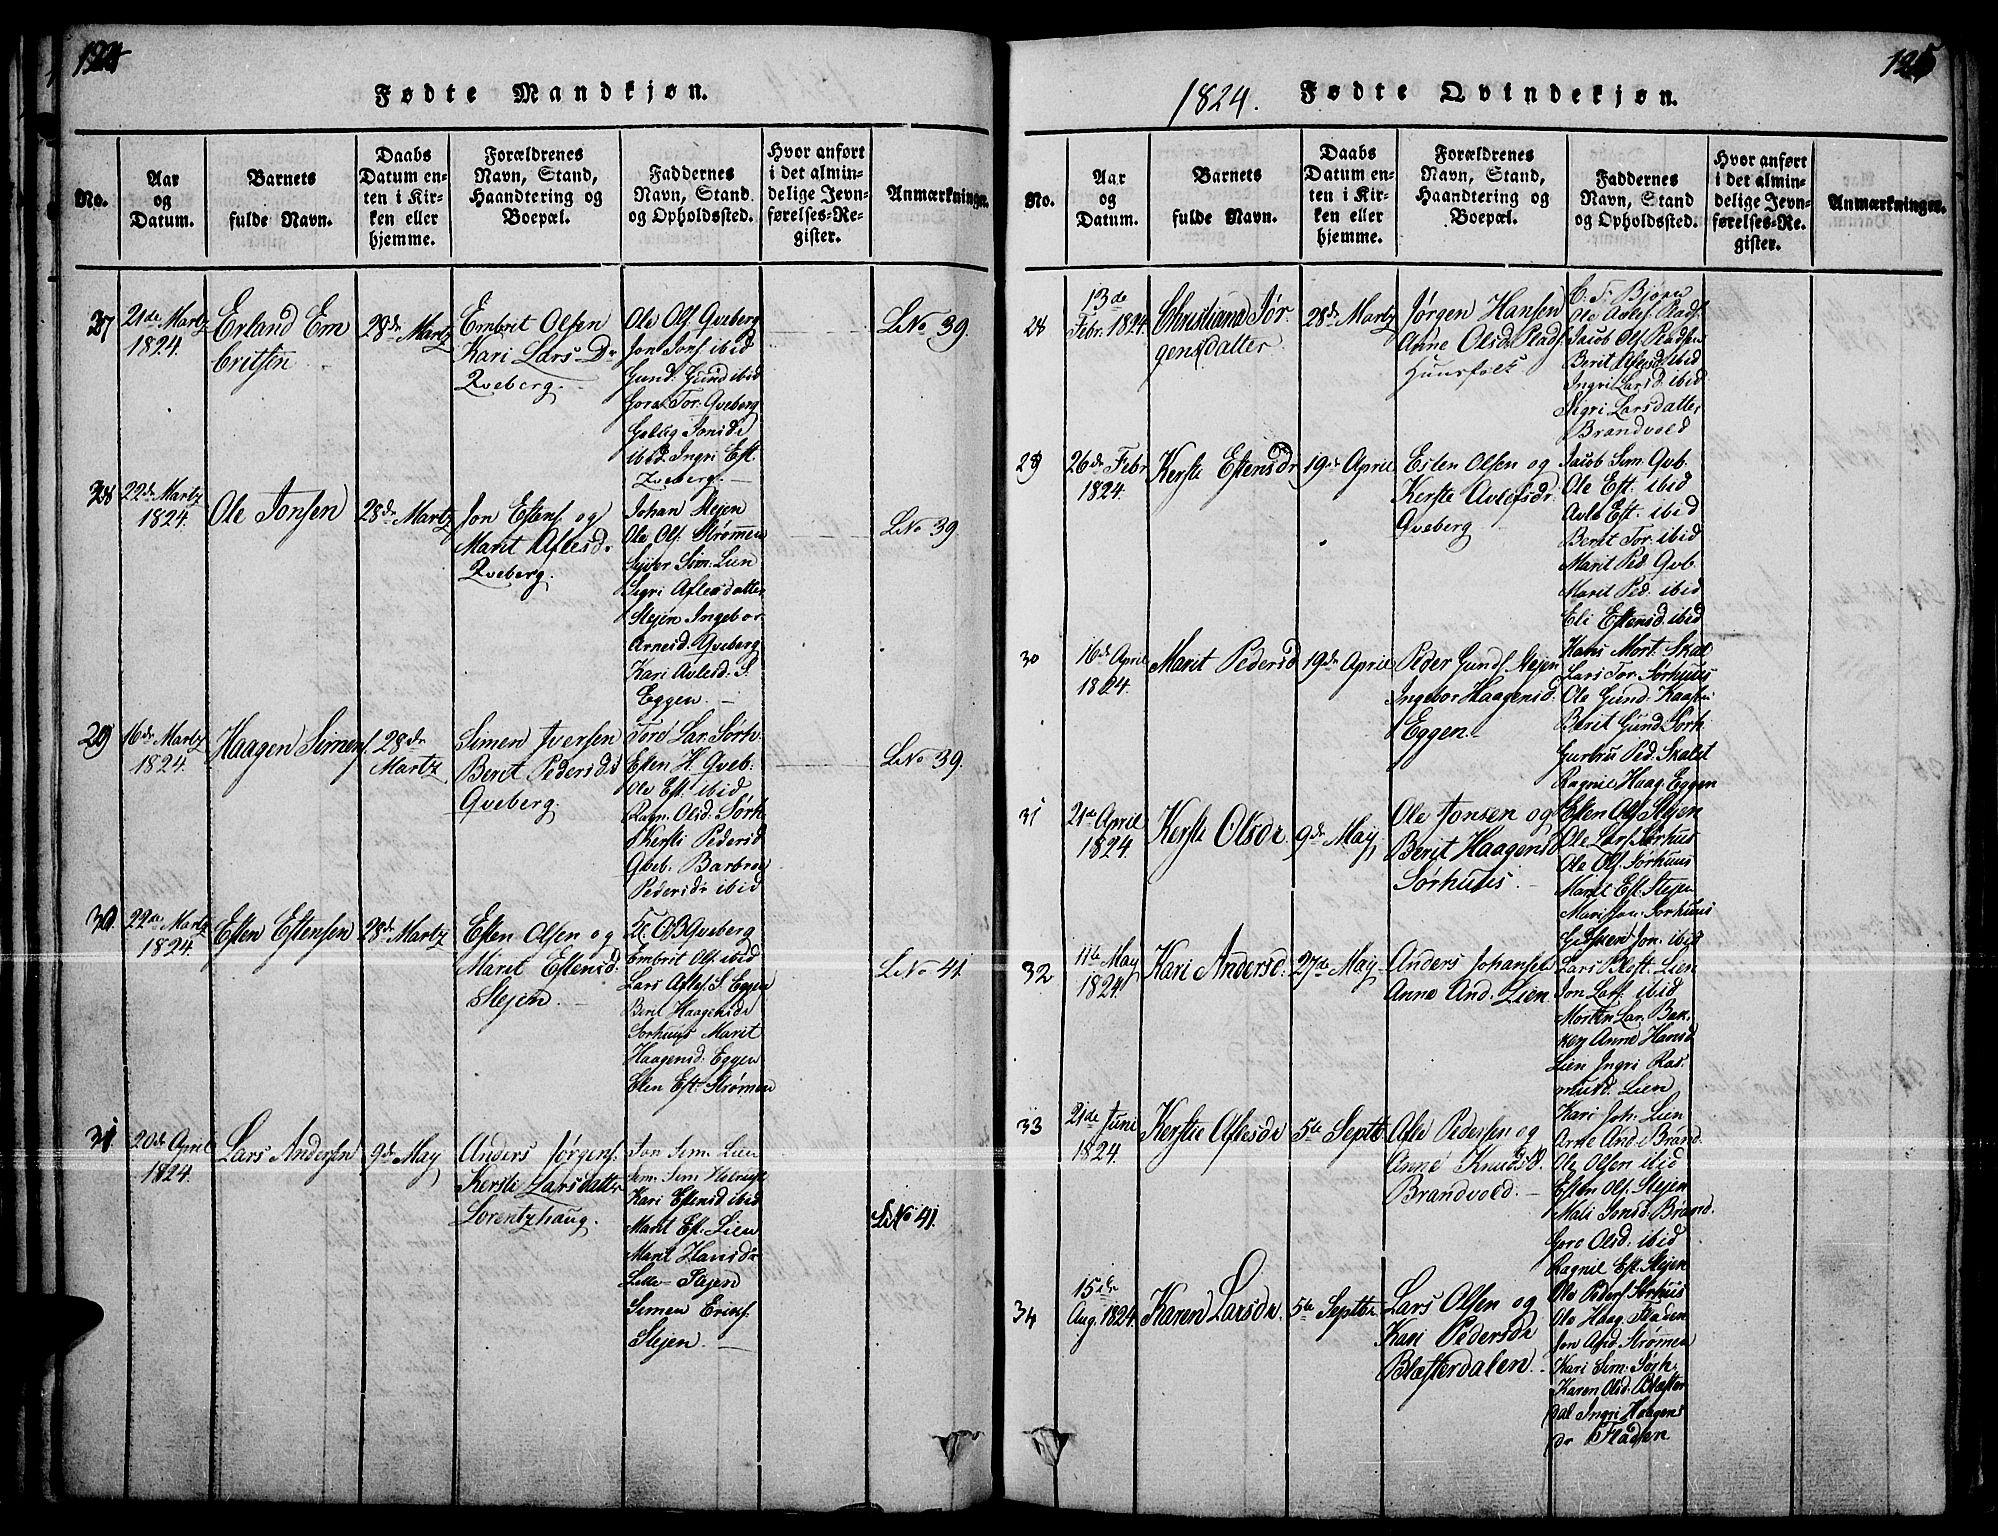 SAH, Tynset prestekontor, Ministerialbok nr. 18, 1815-1829, s. 124-125